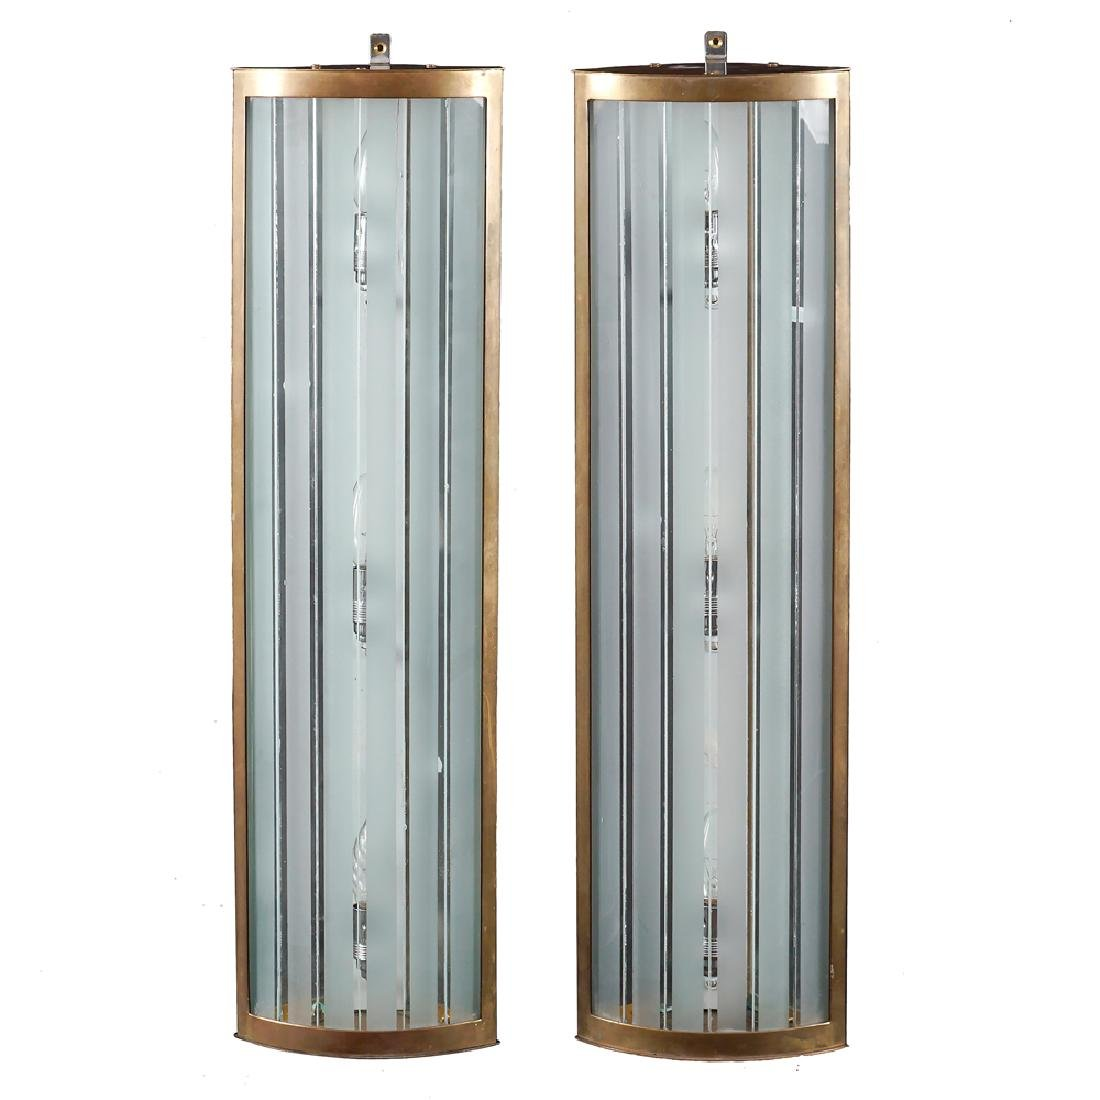 A pair of Art Decò shaped appliques 20th century